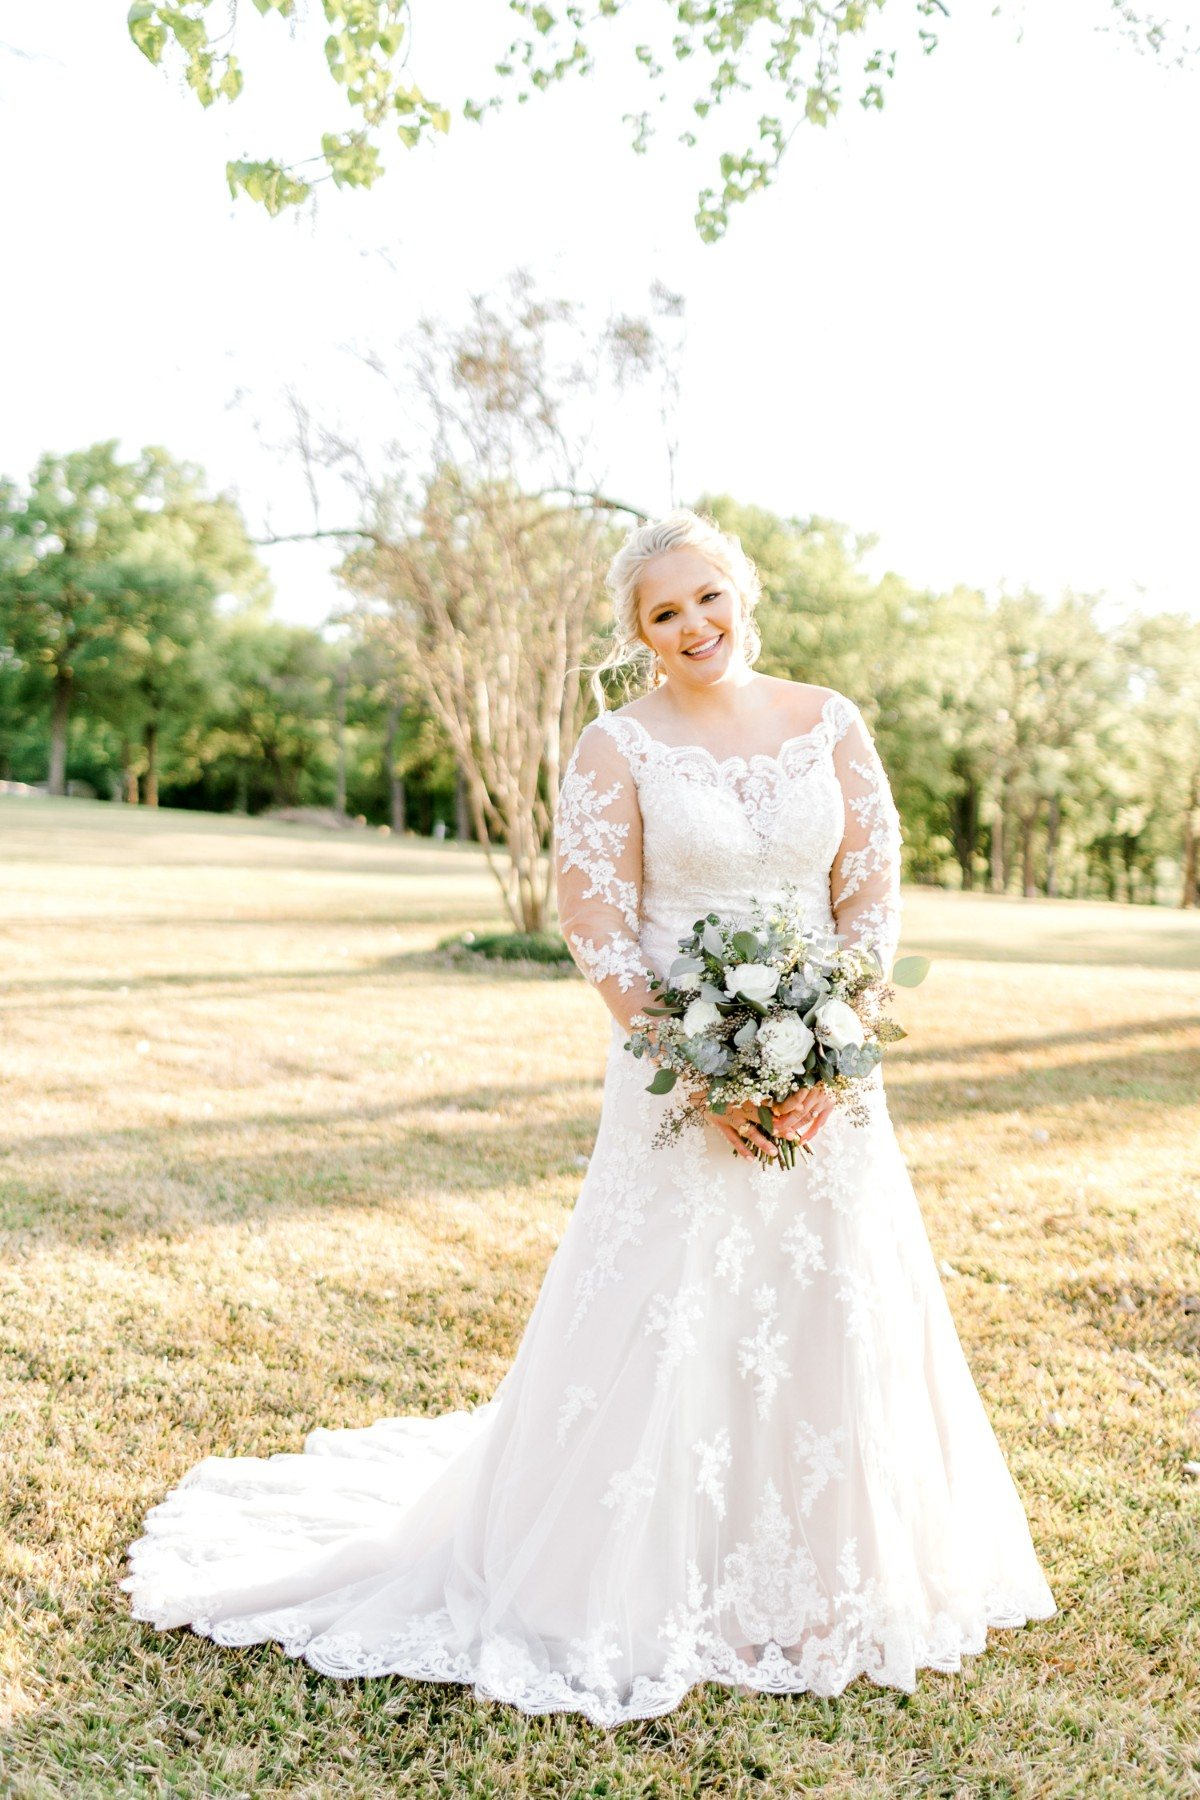 casidy-bridals-tradinghouse-lake-waco-wedding-photographer-kaitlyn-bullard-11.jpg